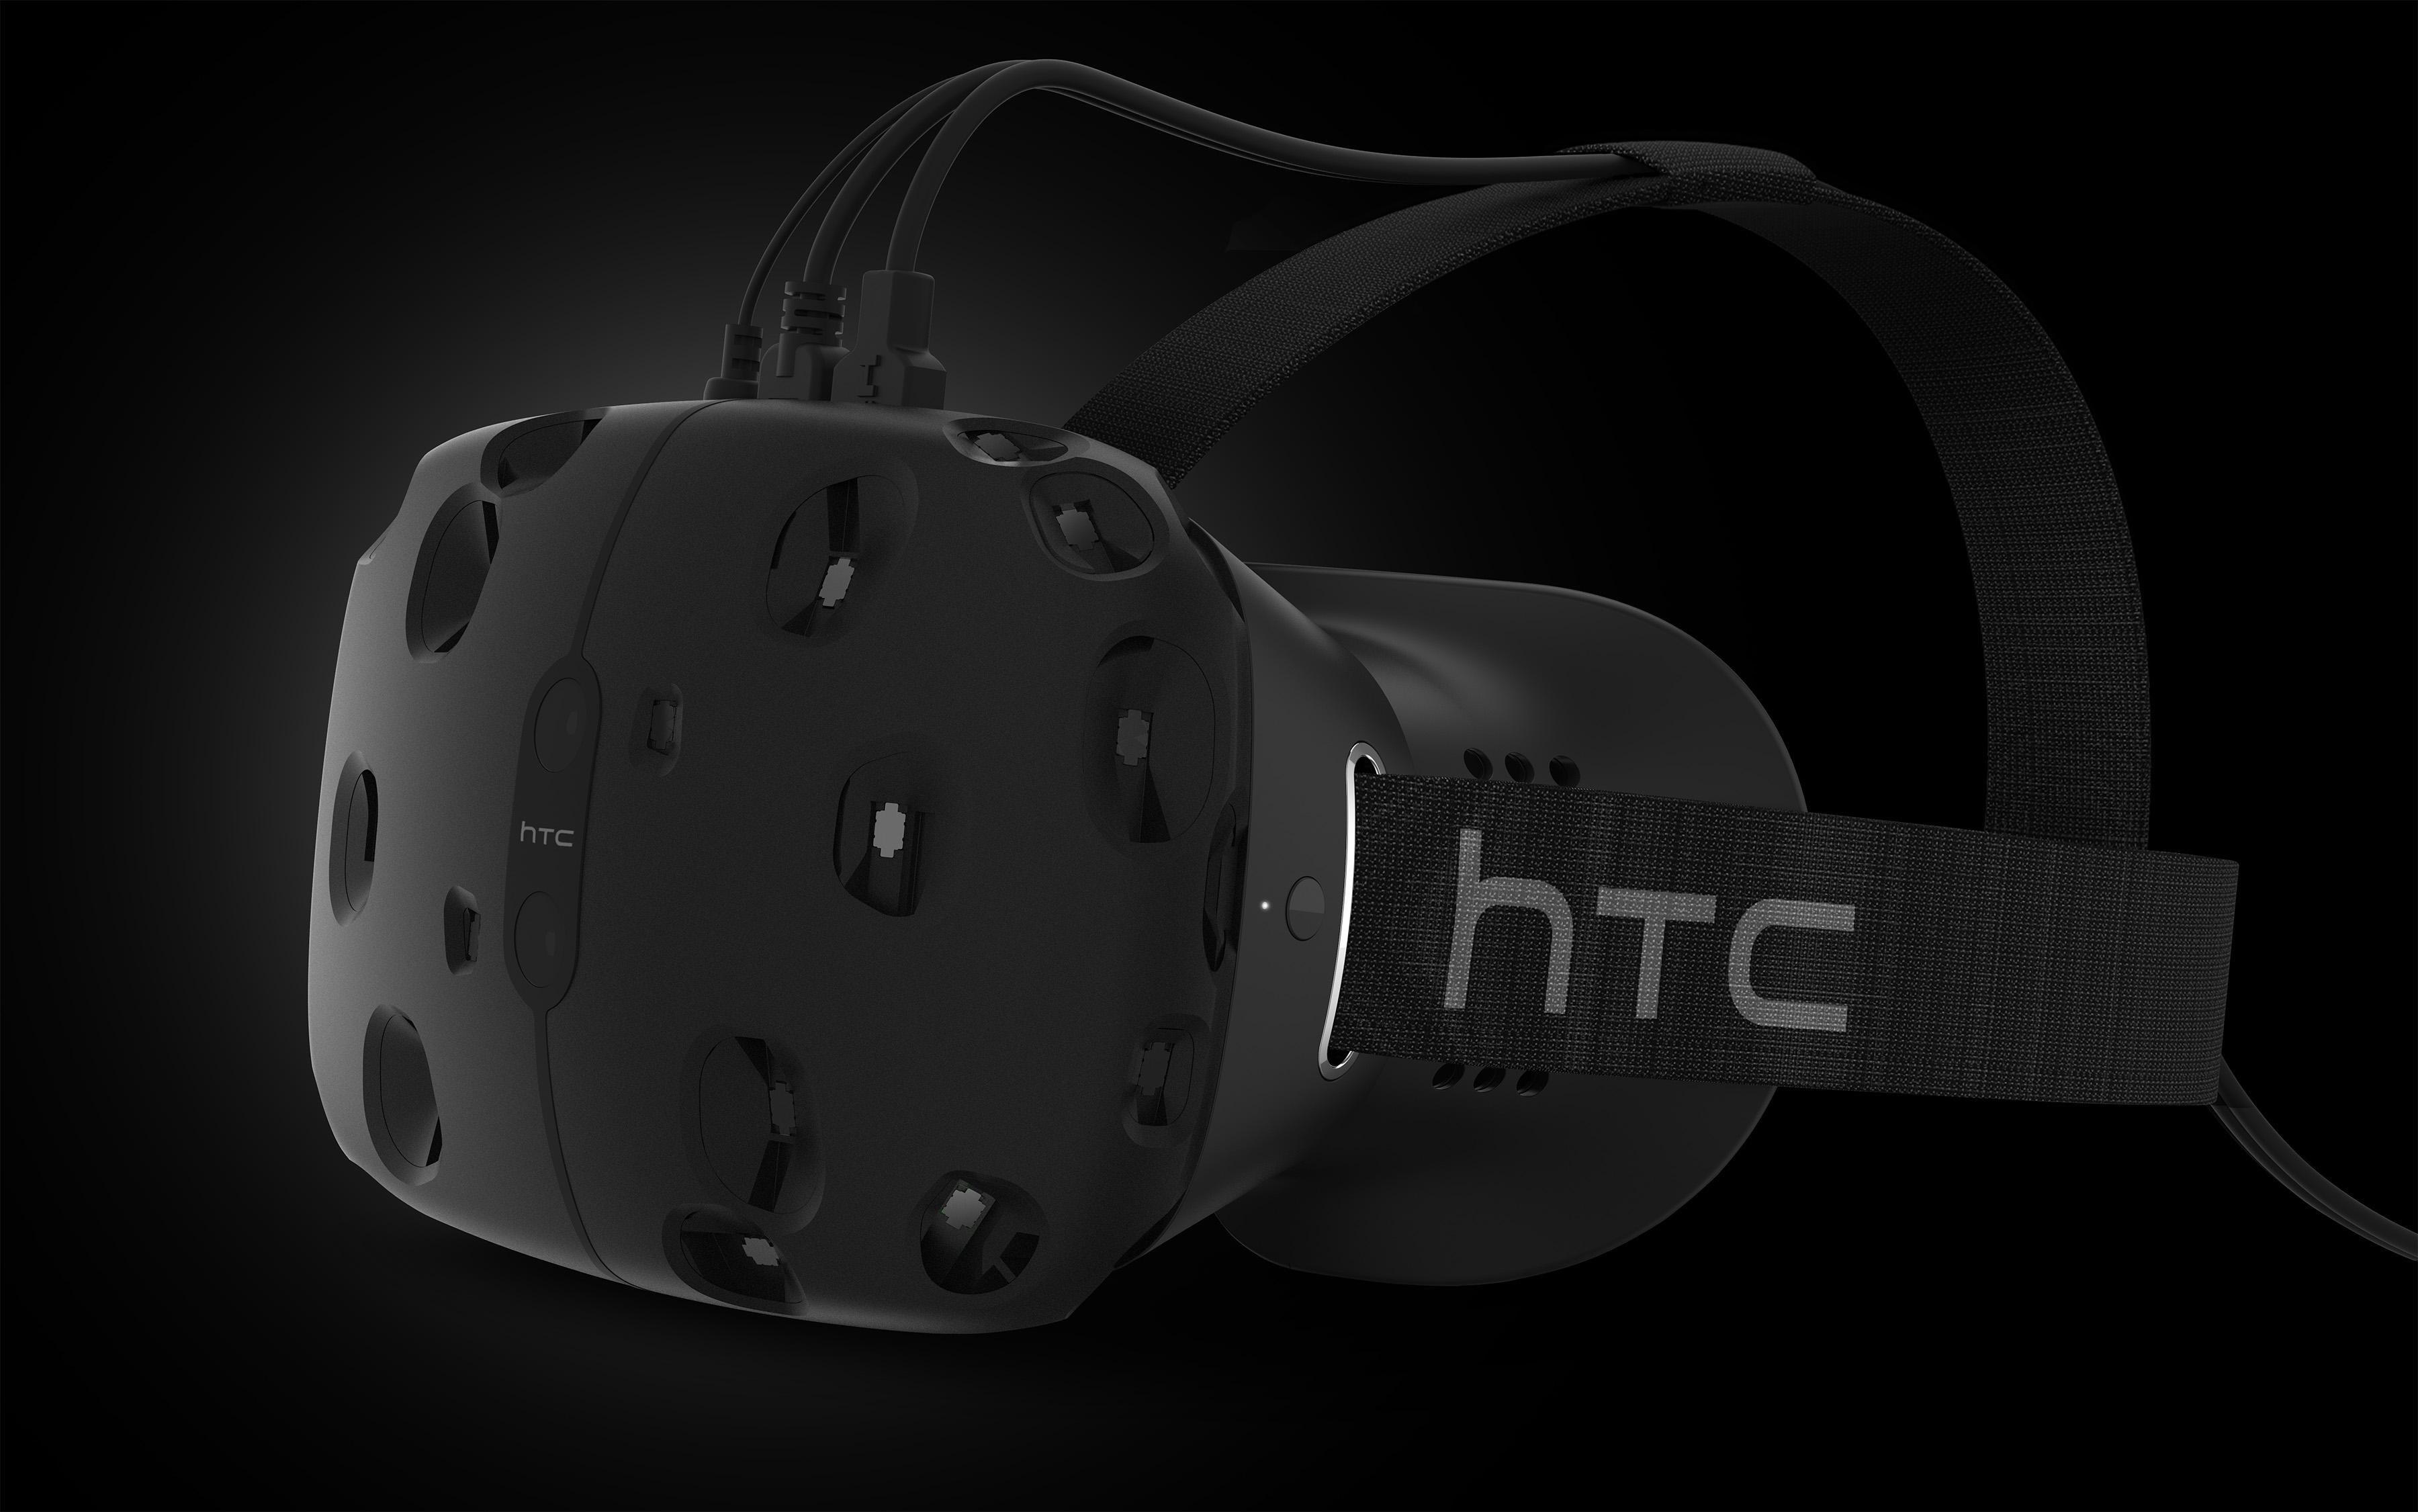 Vive od HTC i Valve zje Oculusa Rift – gracze na PC wreszcie mają swoje gogle VR